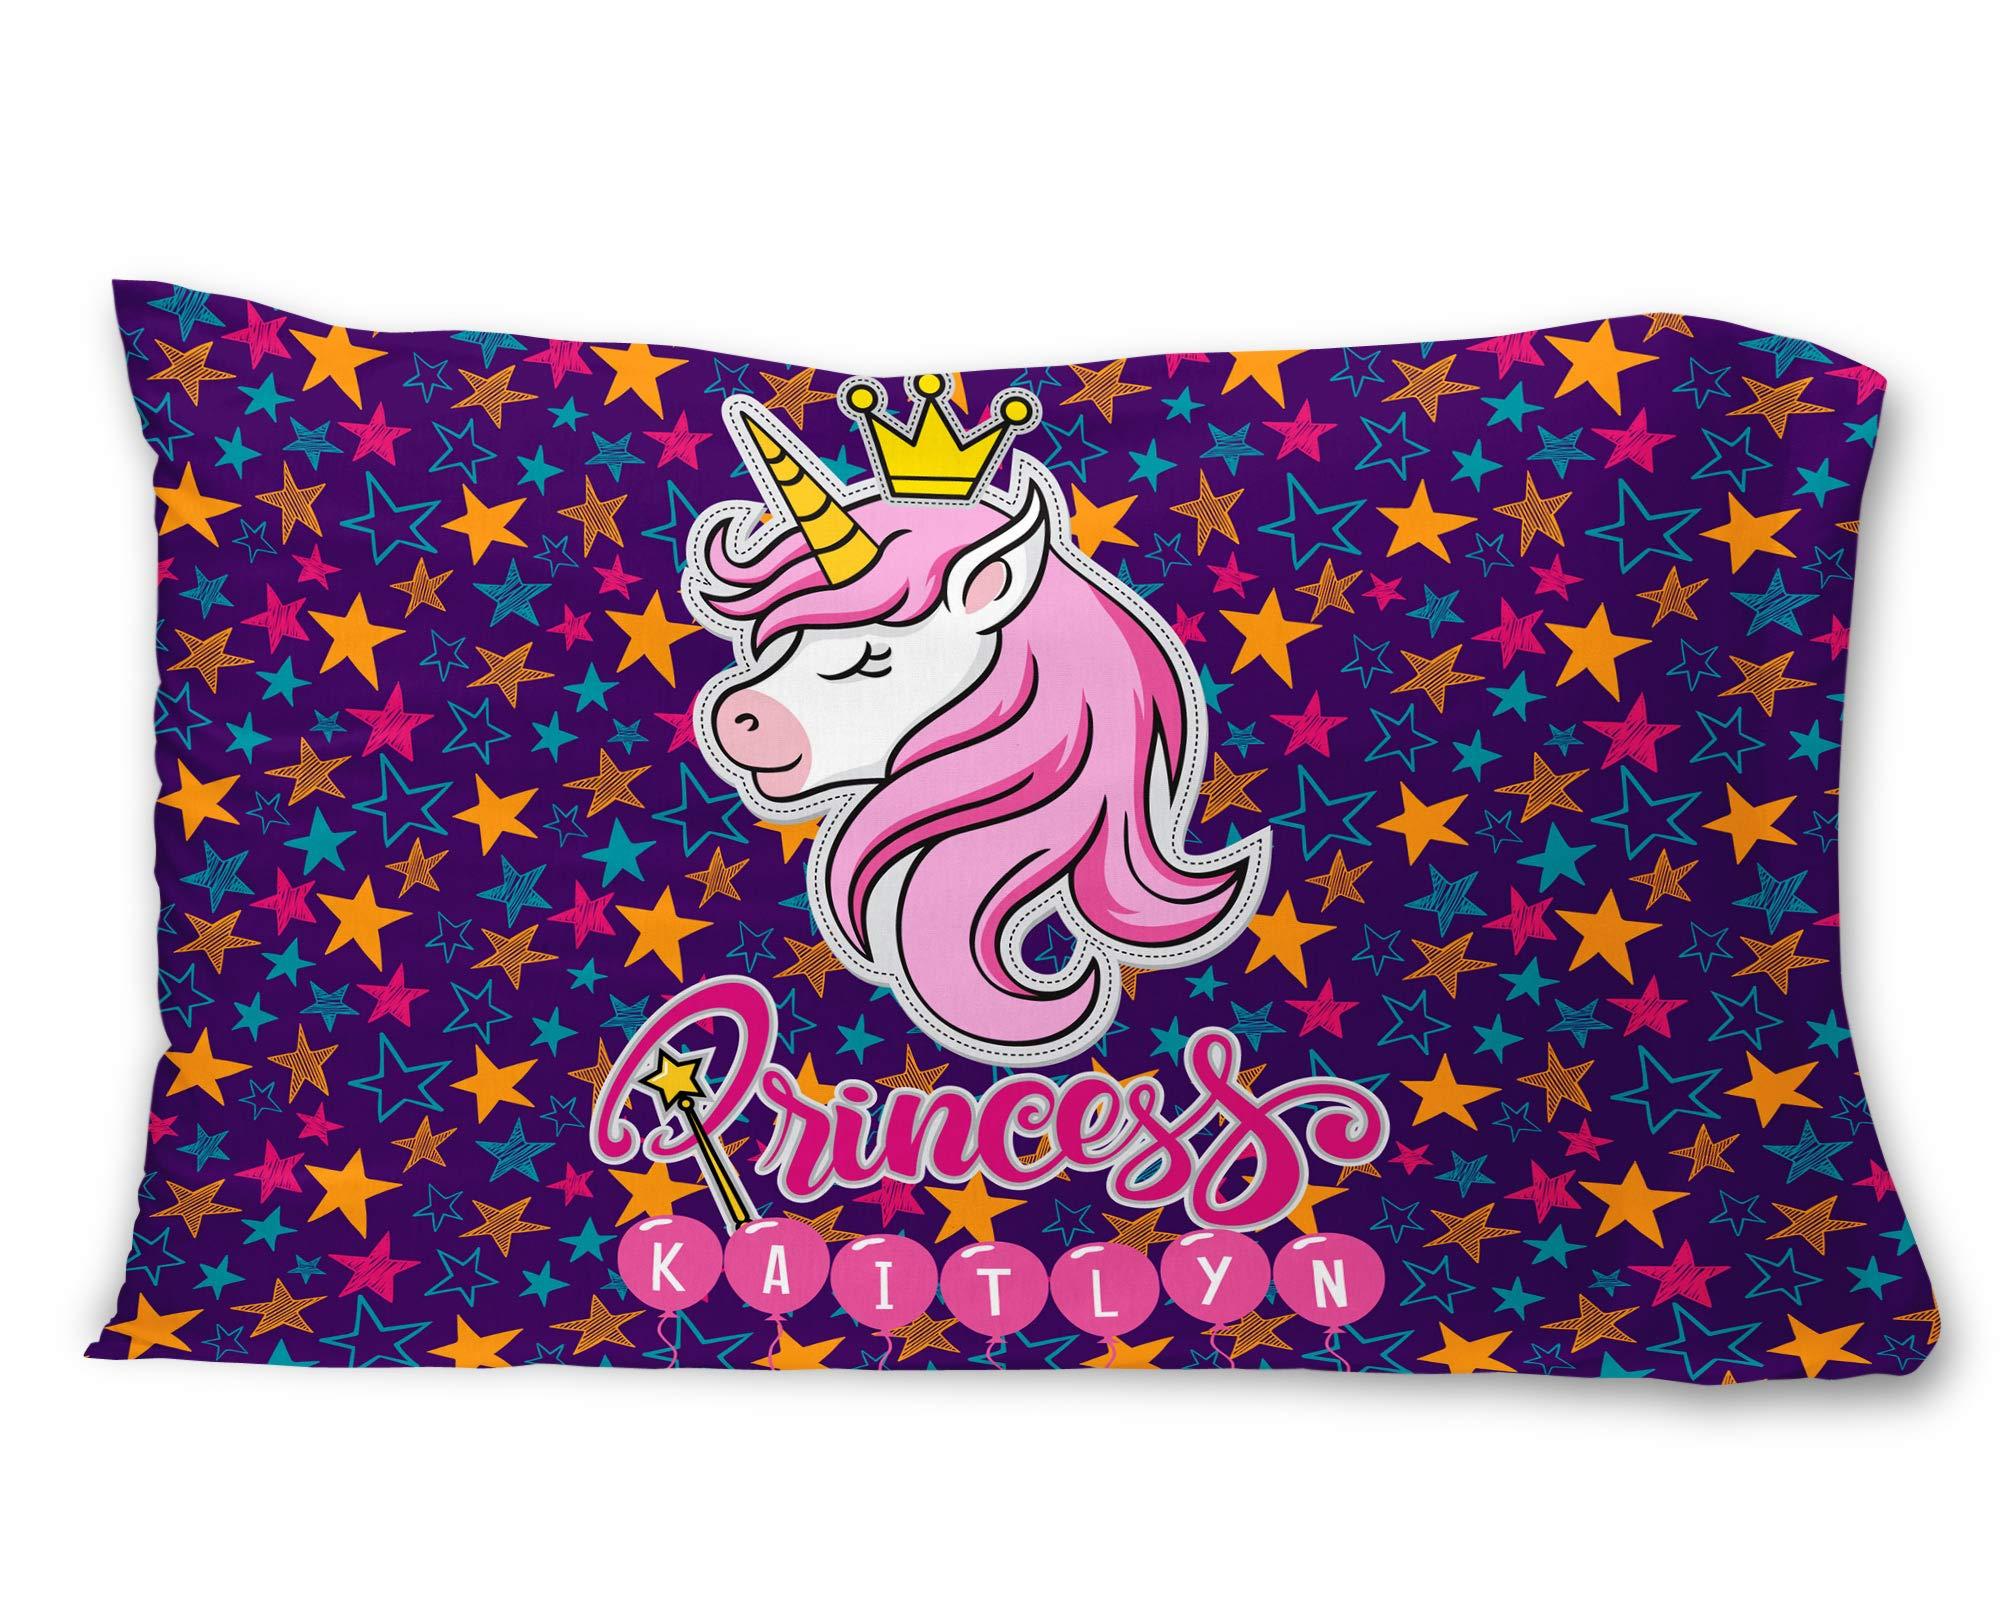 Bad Bananas Unicorn Princess - Kids Custom, Personalized (Customized) Microfiber Pillowcase Gift for Girls (Pillow Cover, Sham) - Fits Standard Size Pillows